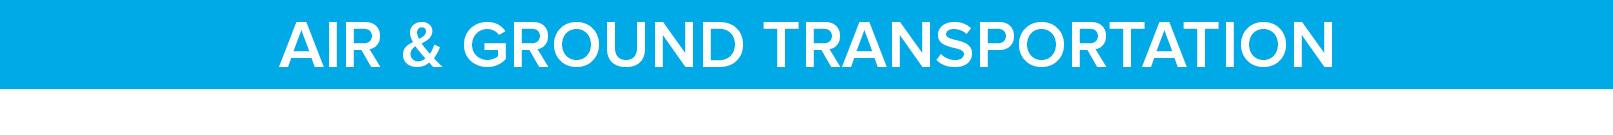 TitleBars_Blue_Air&GroundTransportation.jpg